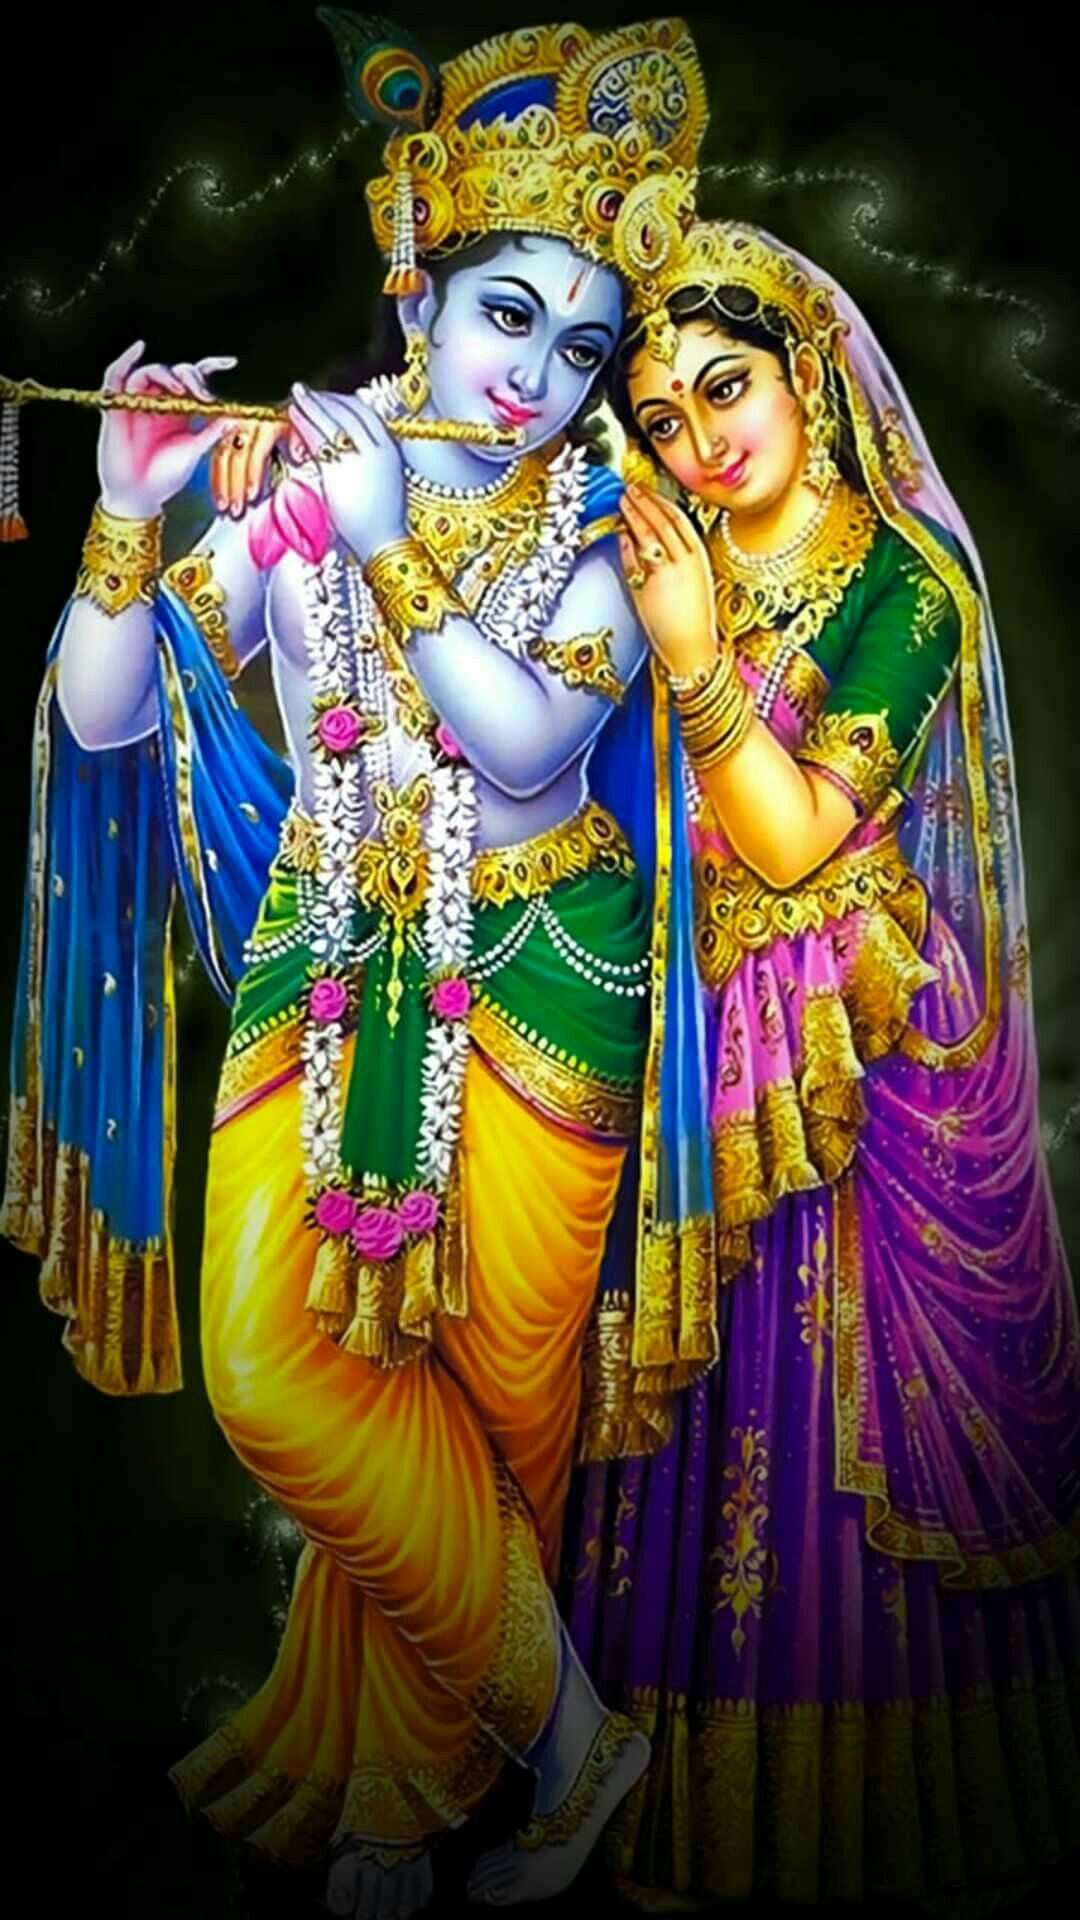 Jay Shri Radhe Krishna Lord Krishna Wallpapers Radha Krishna Images Lord Krishna Images